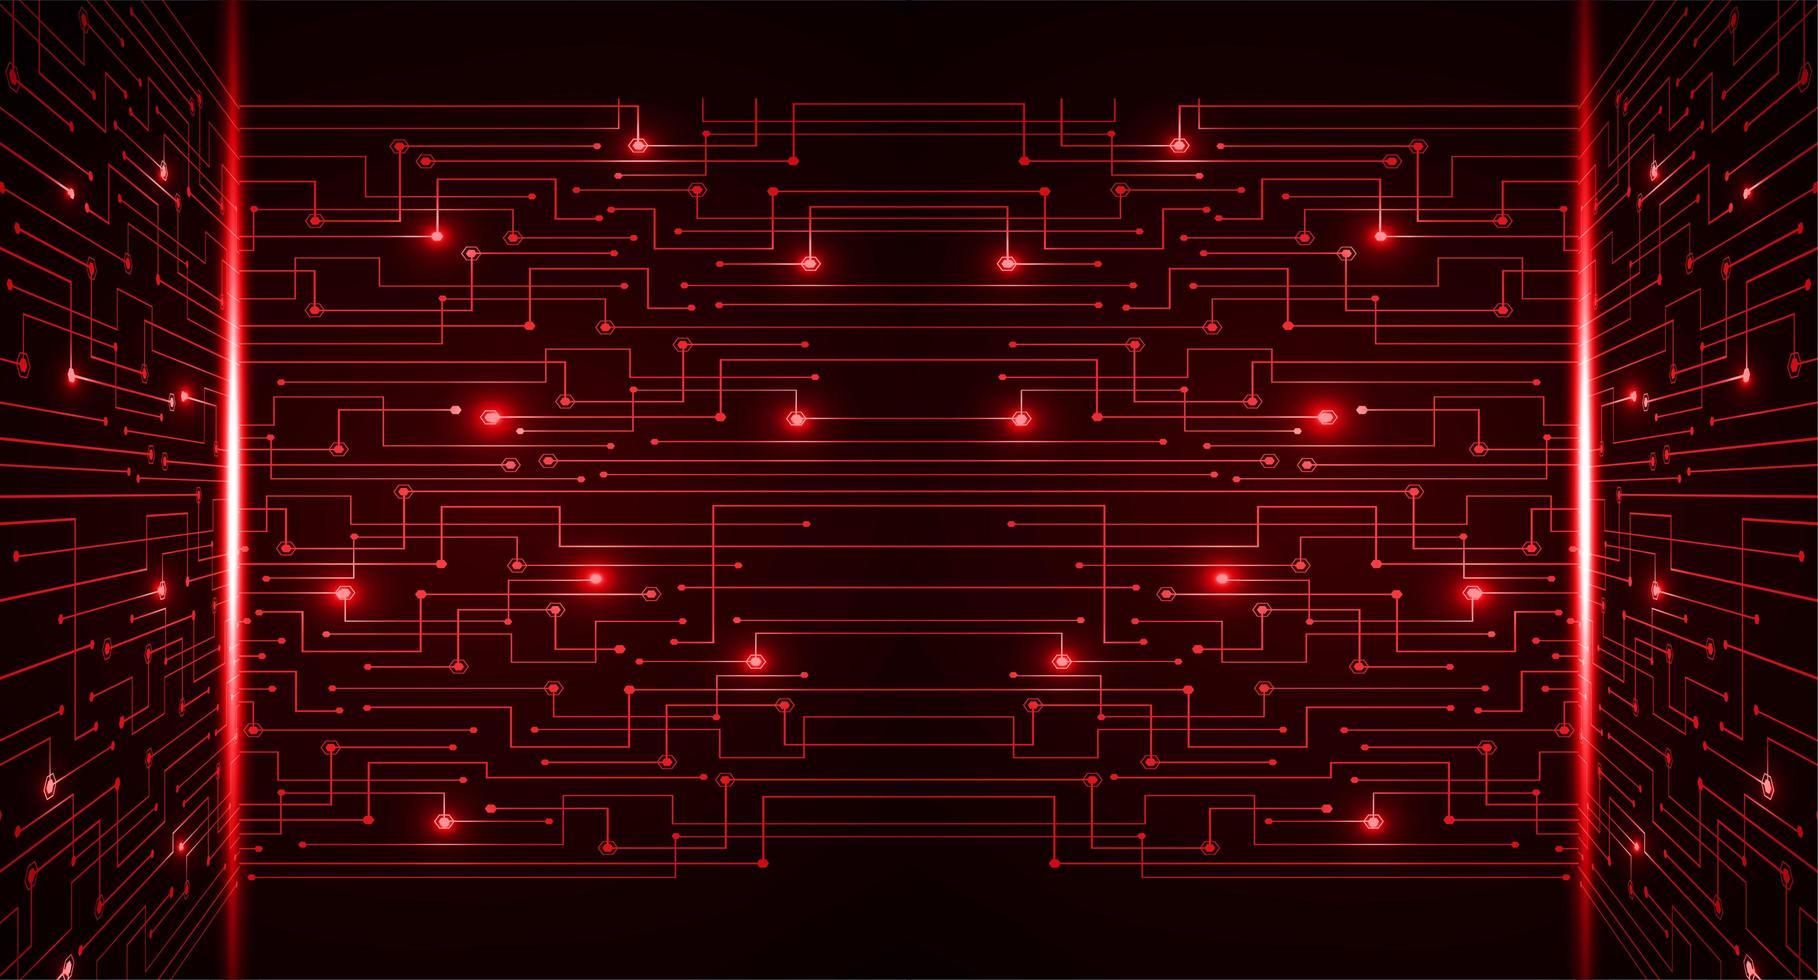 rode cyber circuit toekomstige technologie concept achtergrond vector